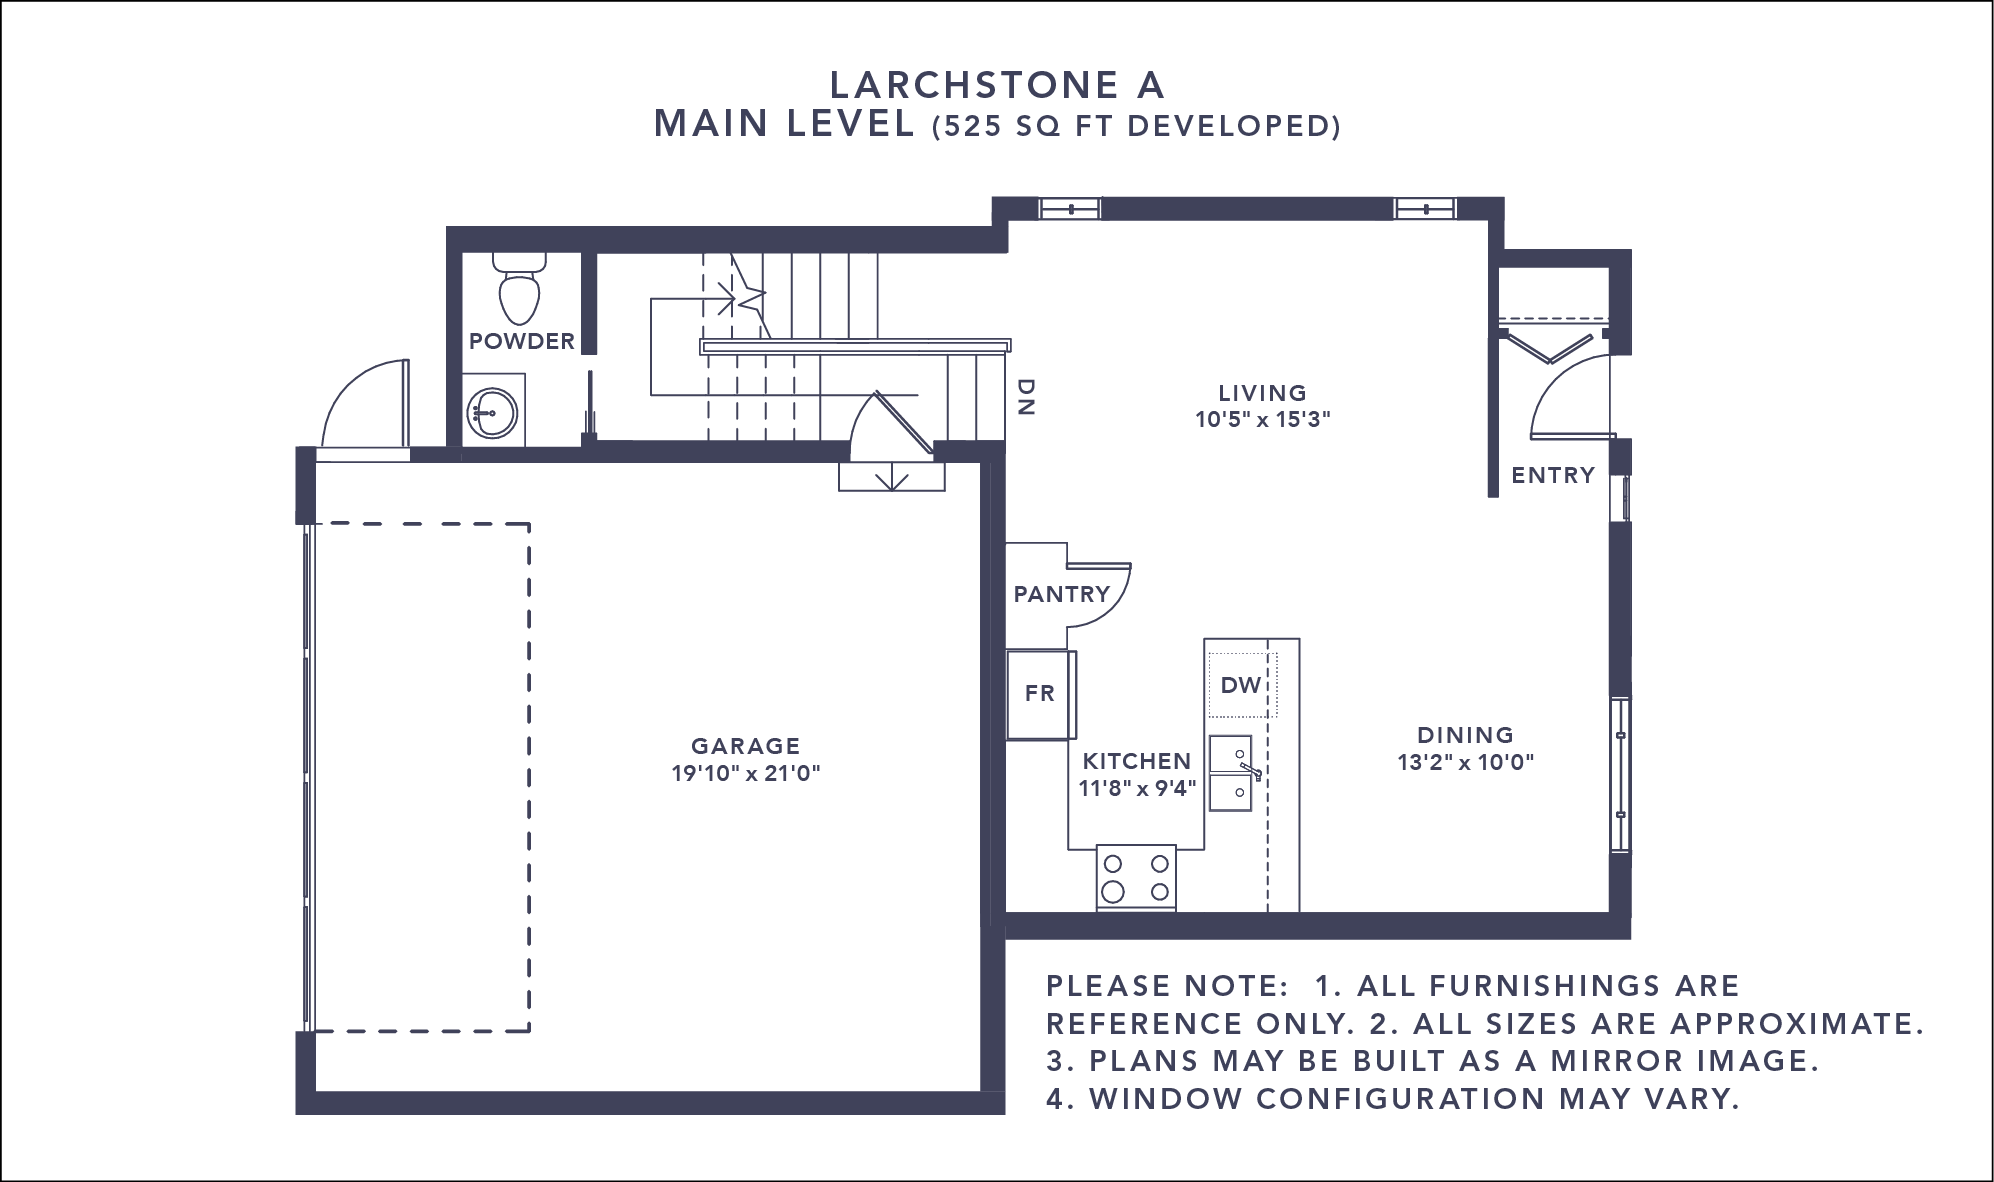 Larchstone A Floorplan - Main Level